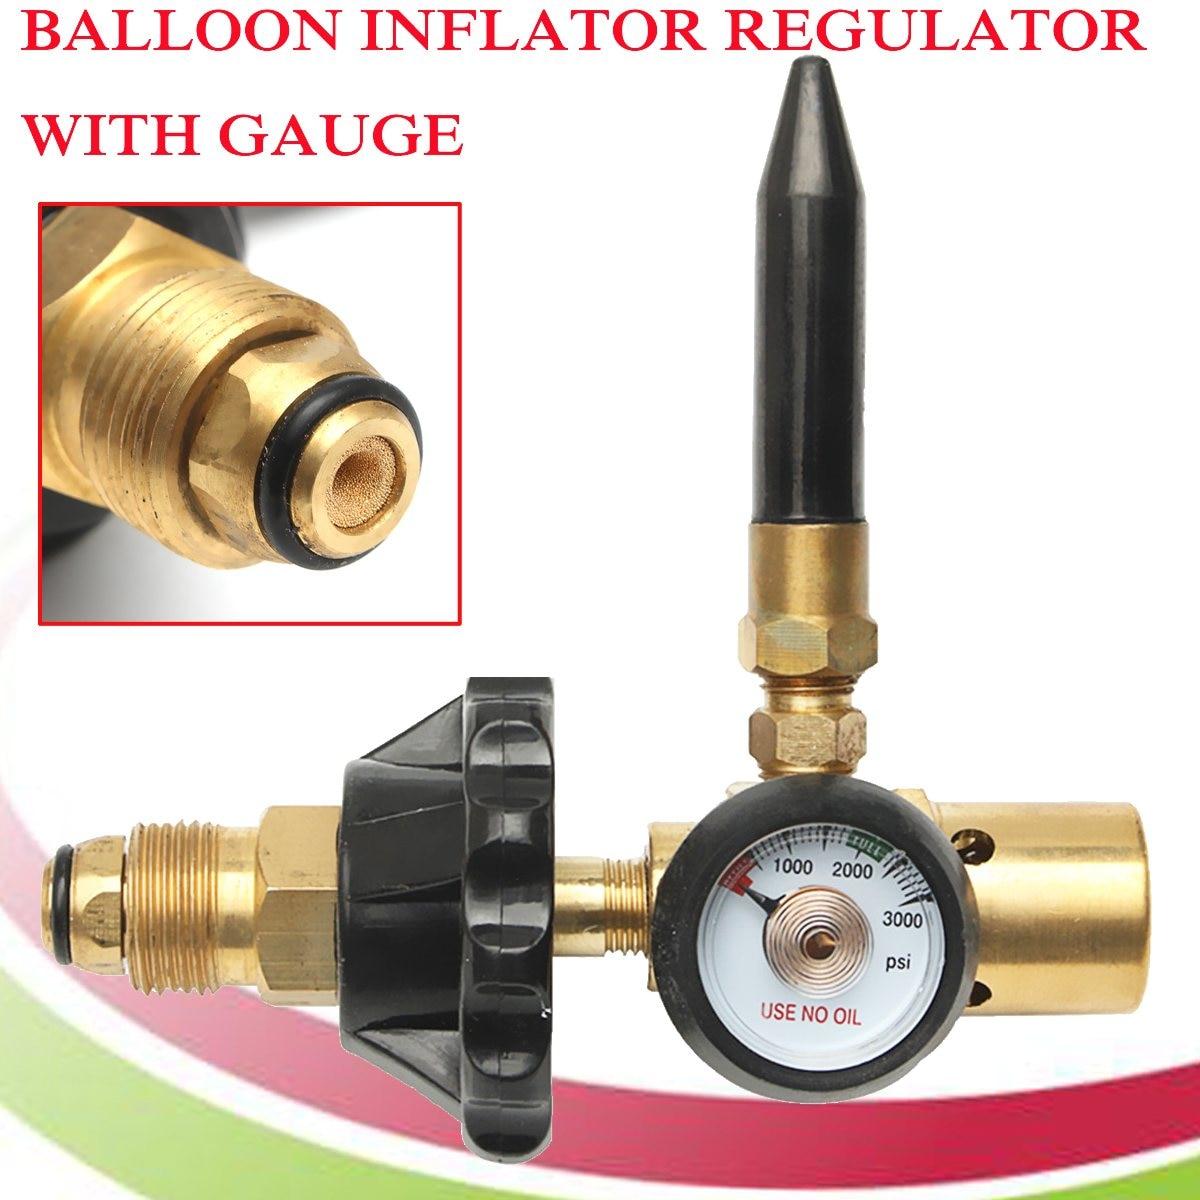 Brass Helium Latex Balloon Inflator Regulator With Pressure Gauge For G5/8 Tank Valves Mayitr 145*135mm